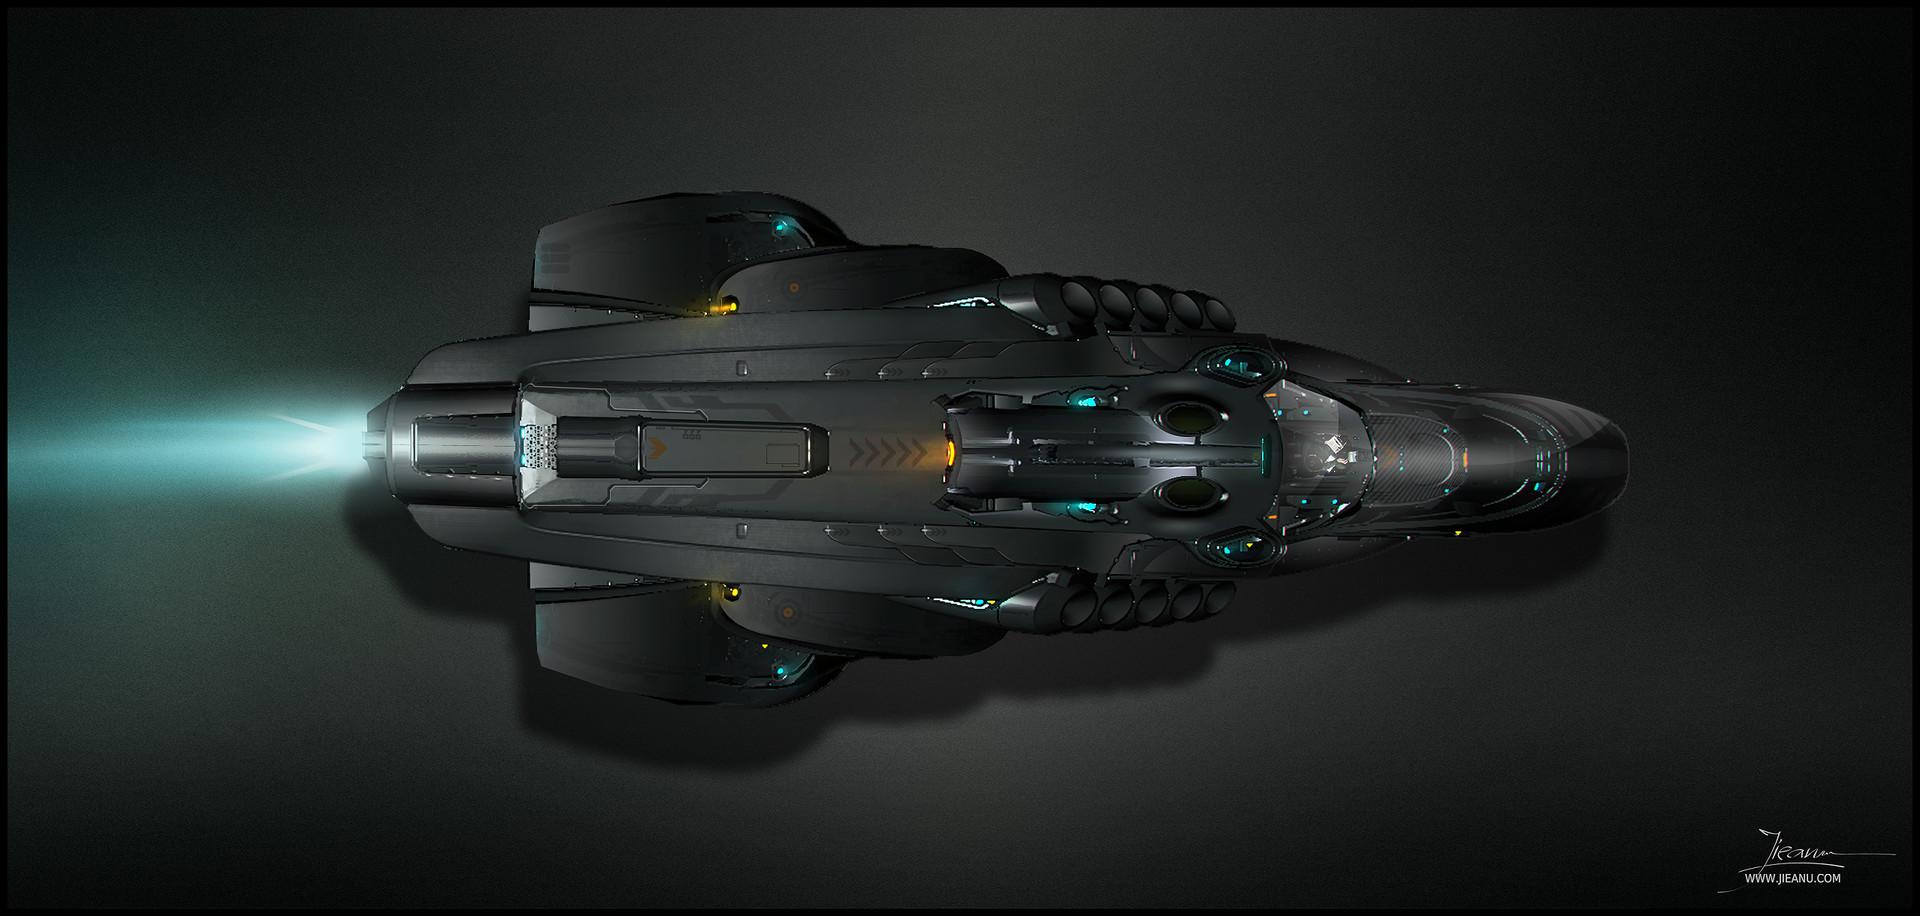 future rocket ship - 1155×691